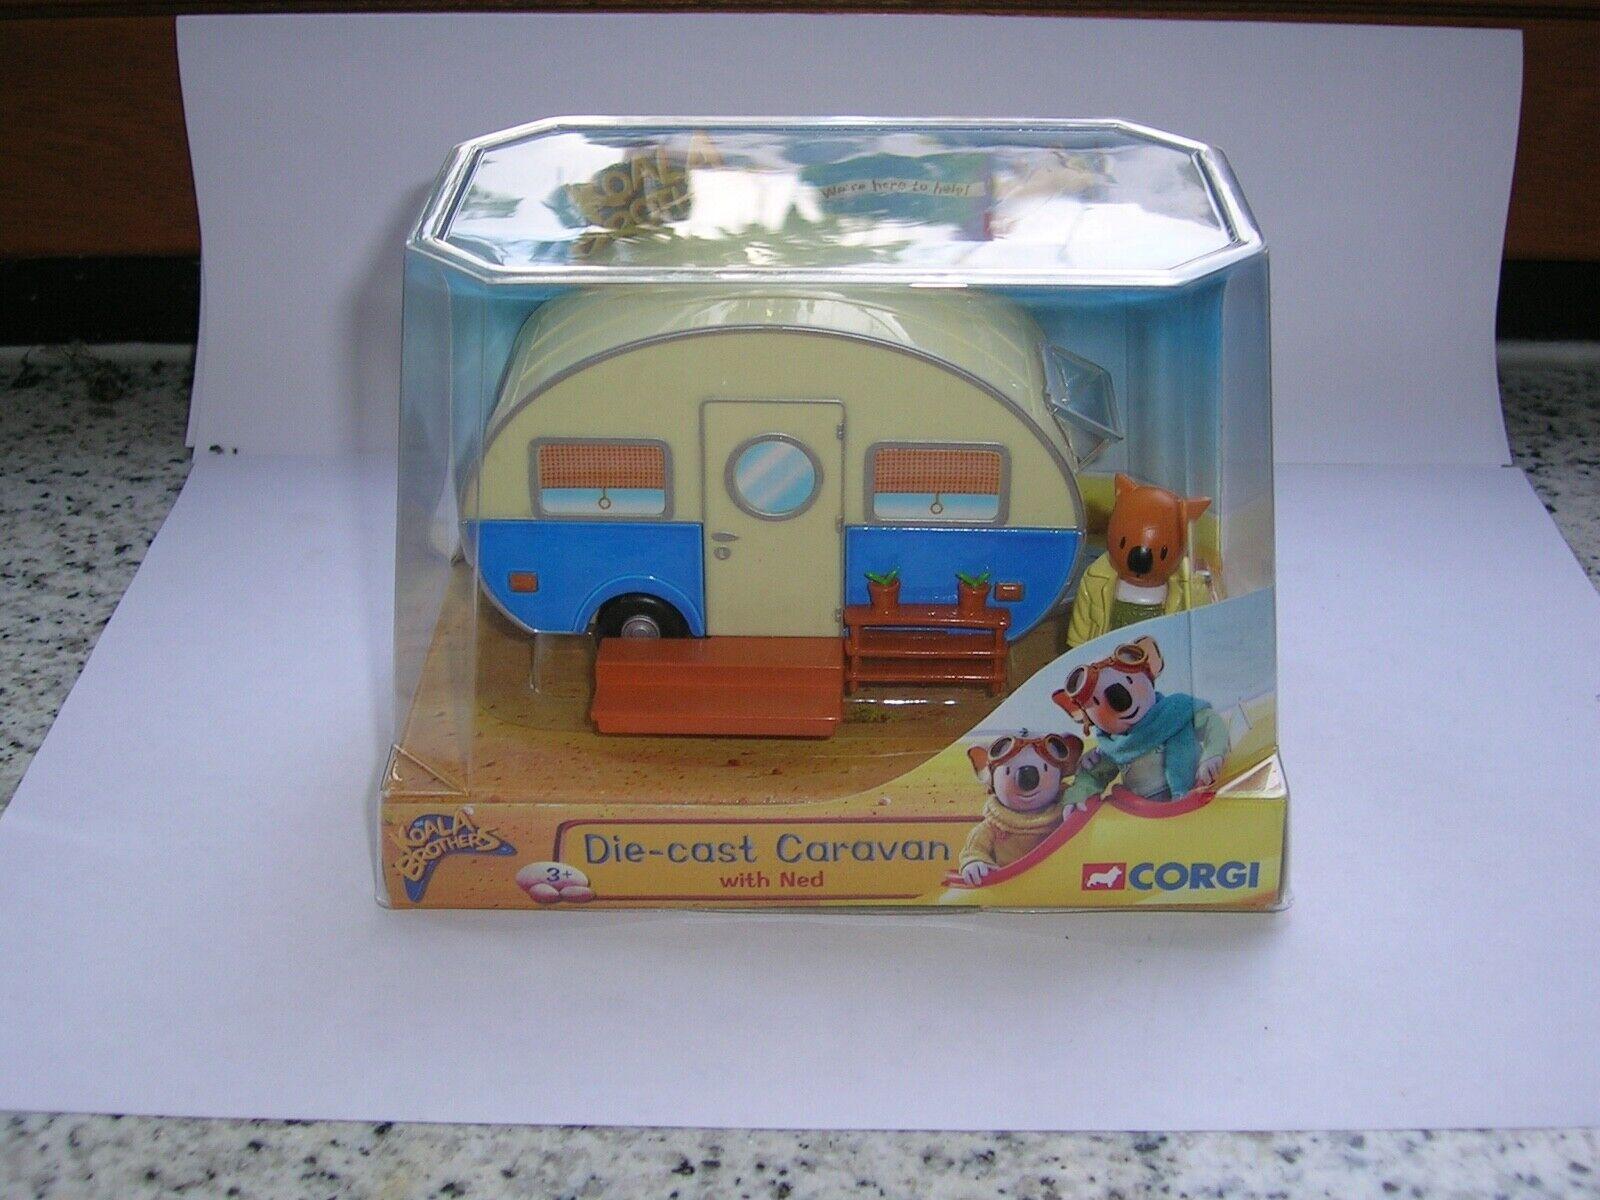 Corgi Toys Koala Brothers Die-Cast Caravan-new,OSS,FREE INTL.SHIPPING